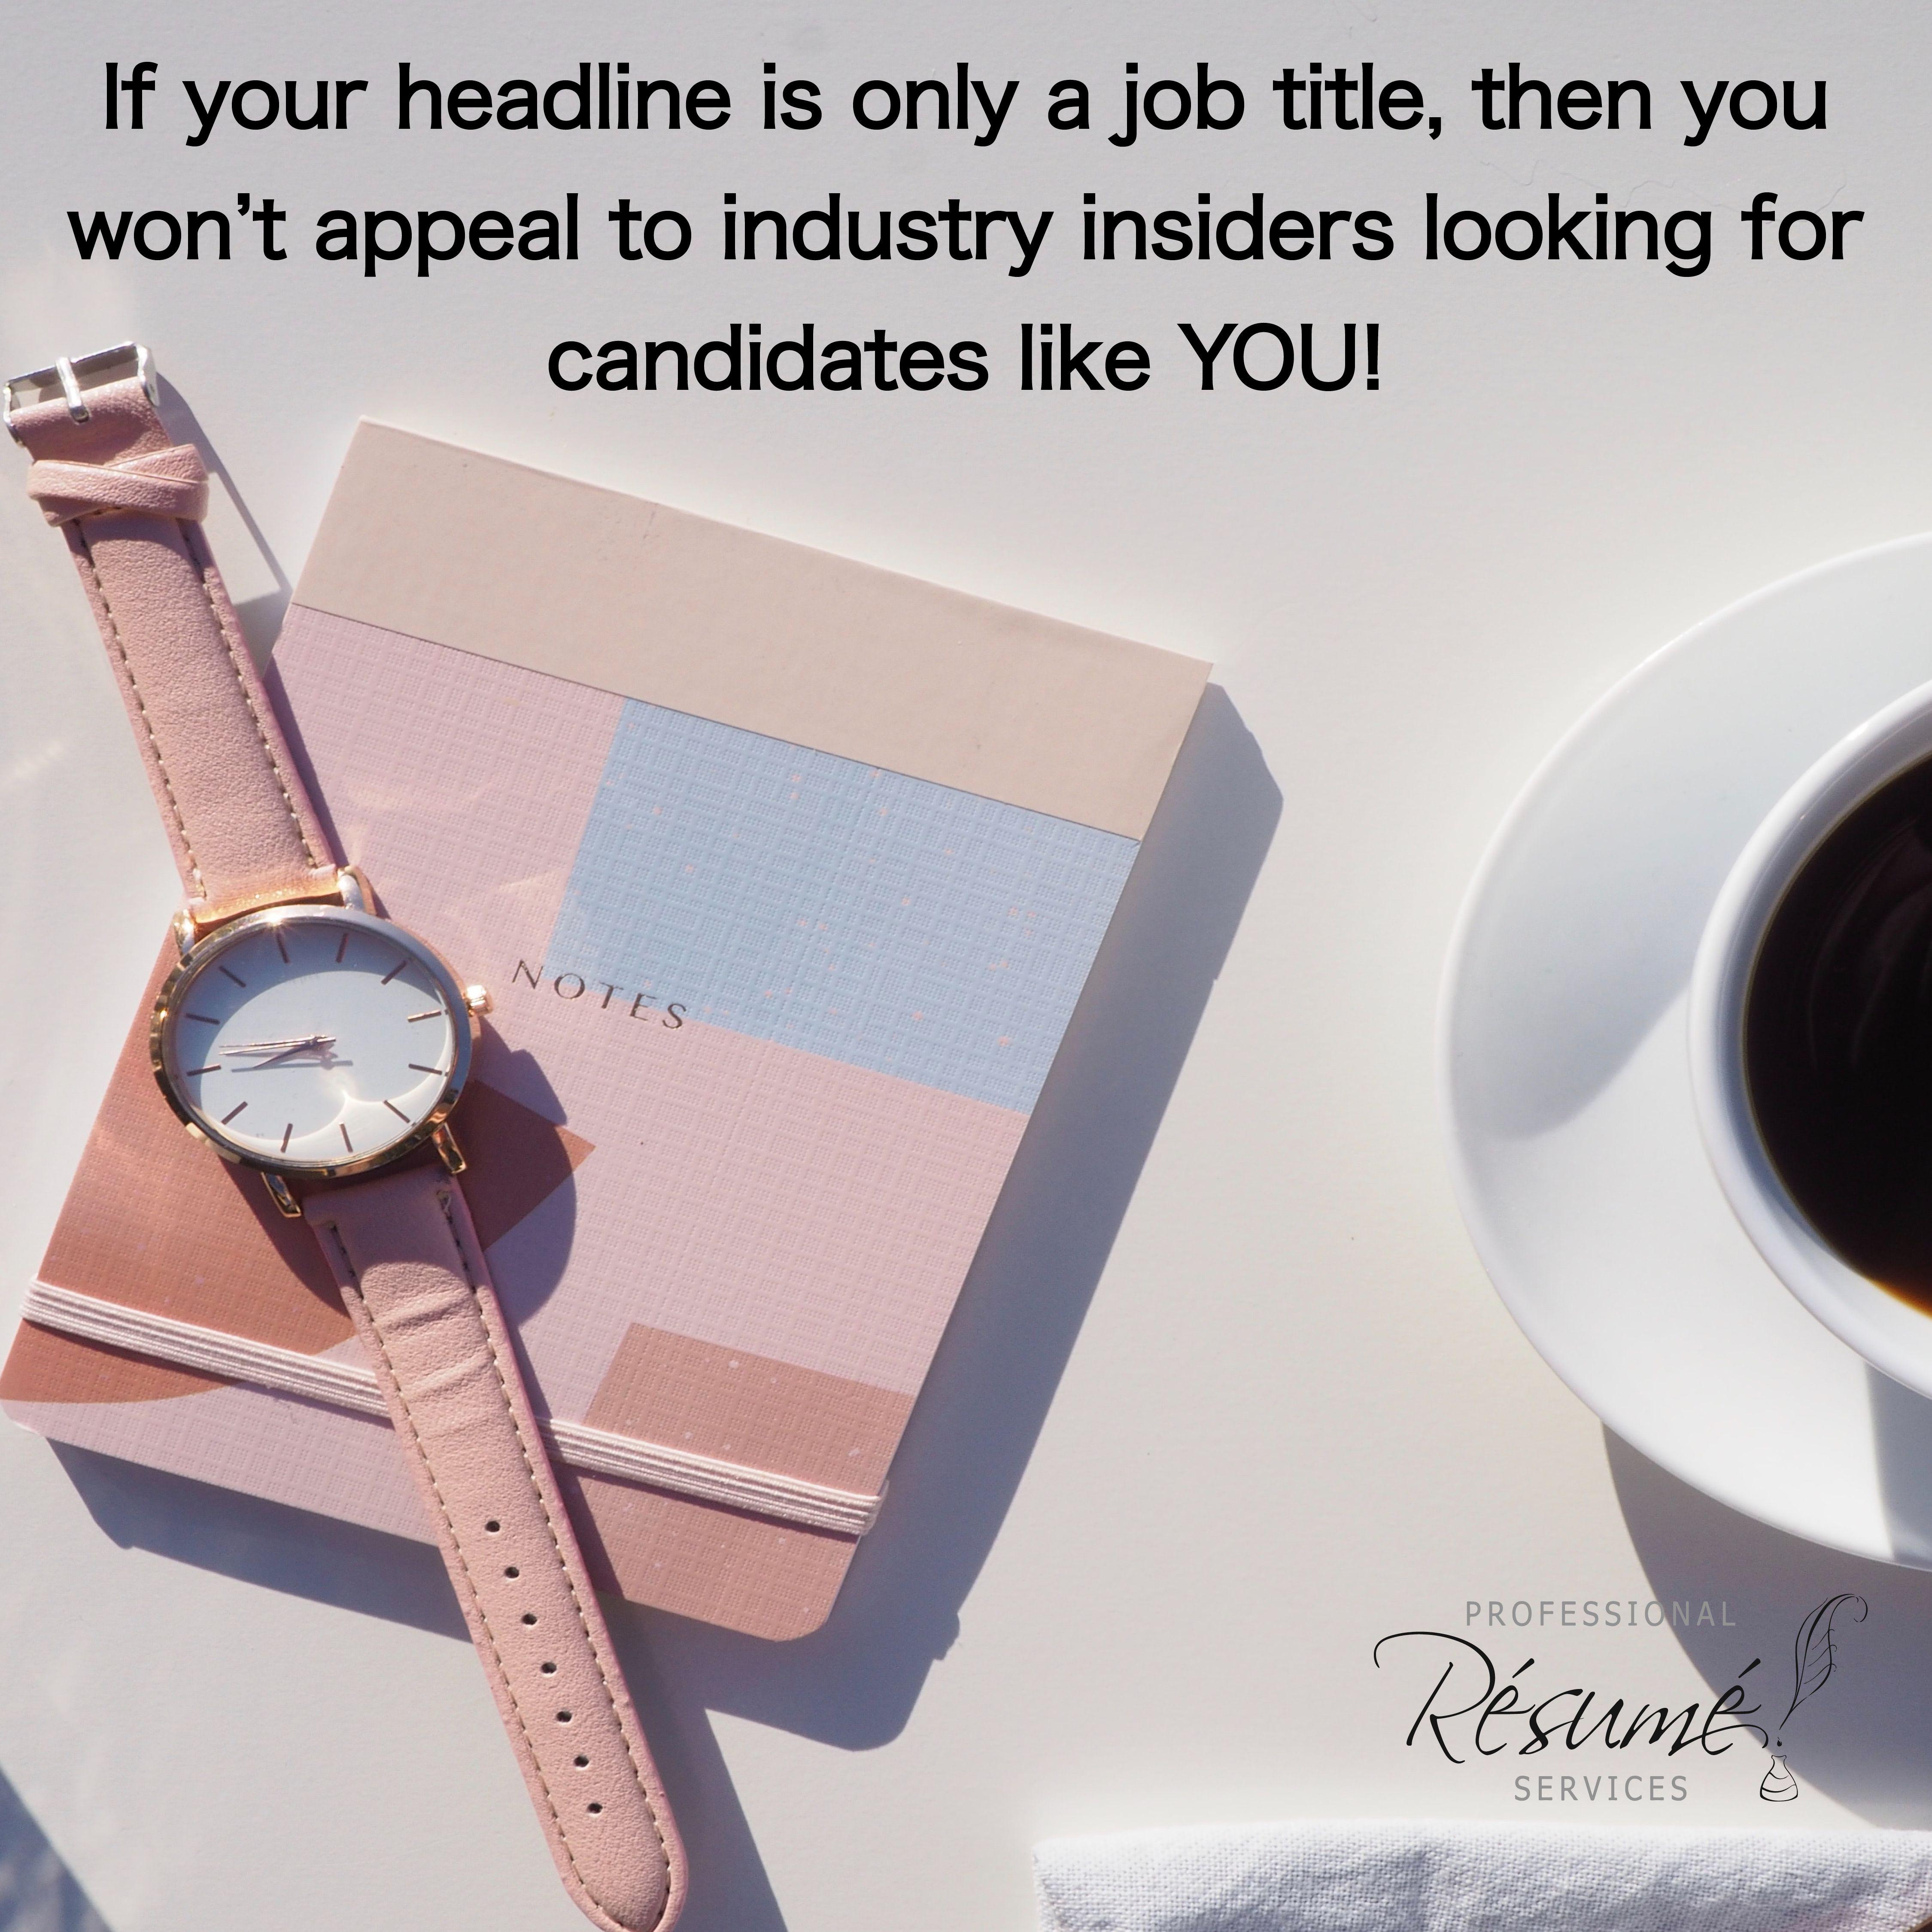 Linkedin headlines resume services job title